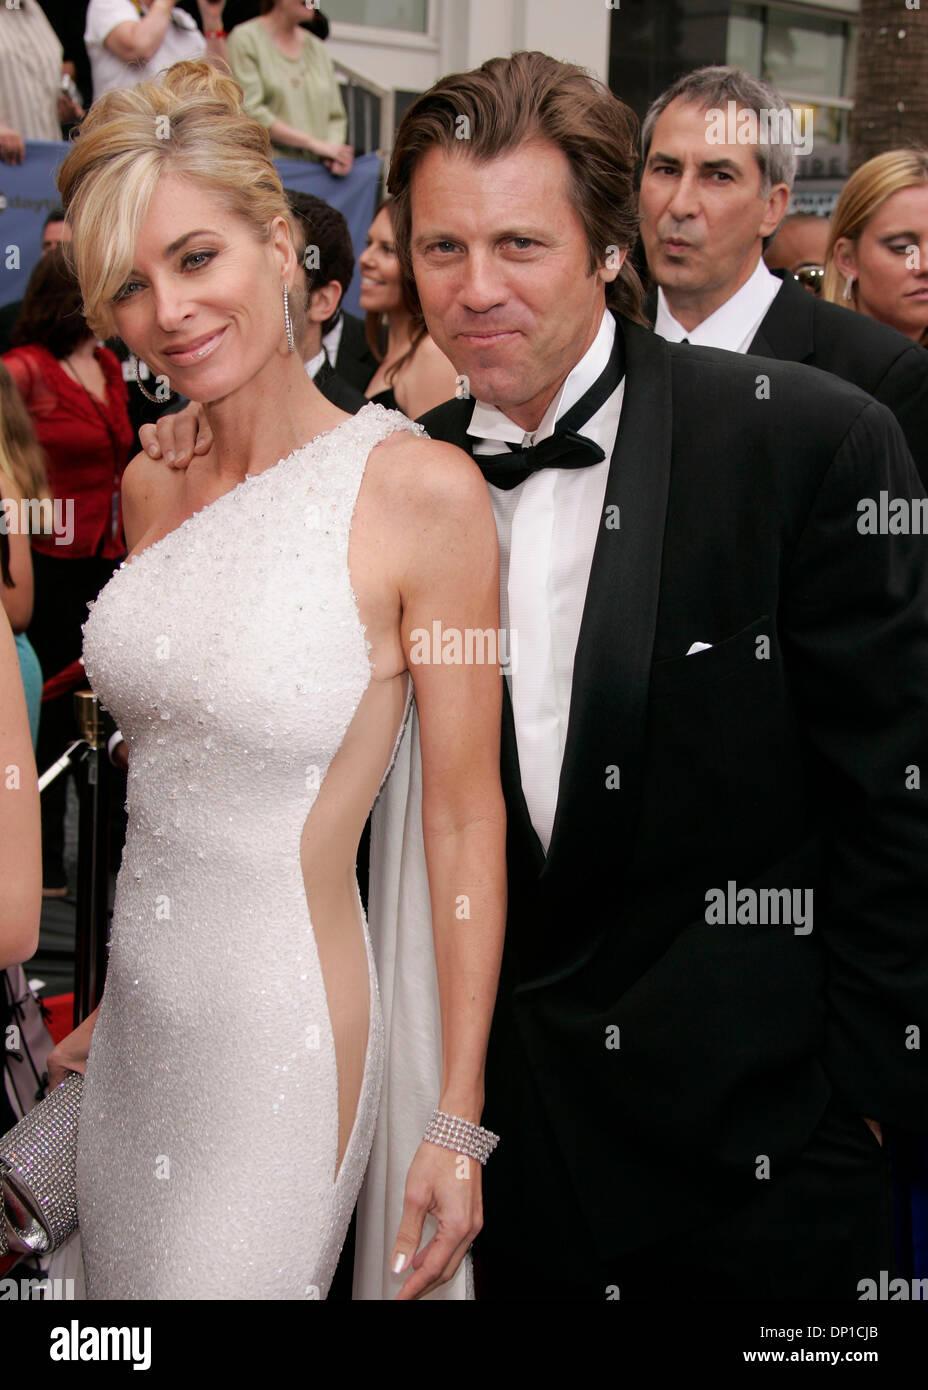 Apr 28, 2006; Hollywood, CA, USA; EILEEN DAVIDSON & VINCE